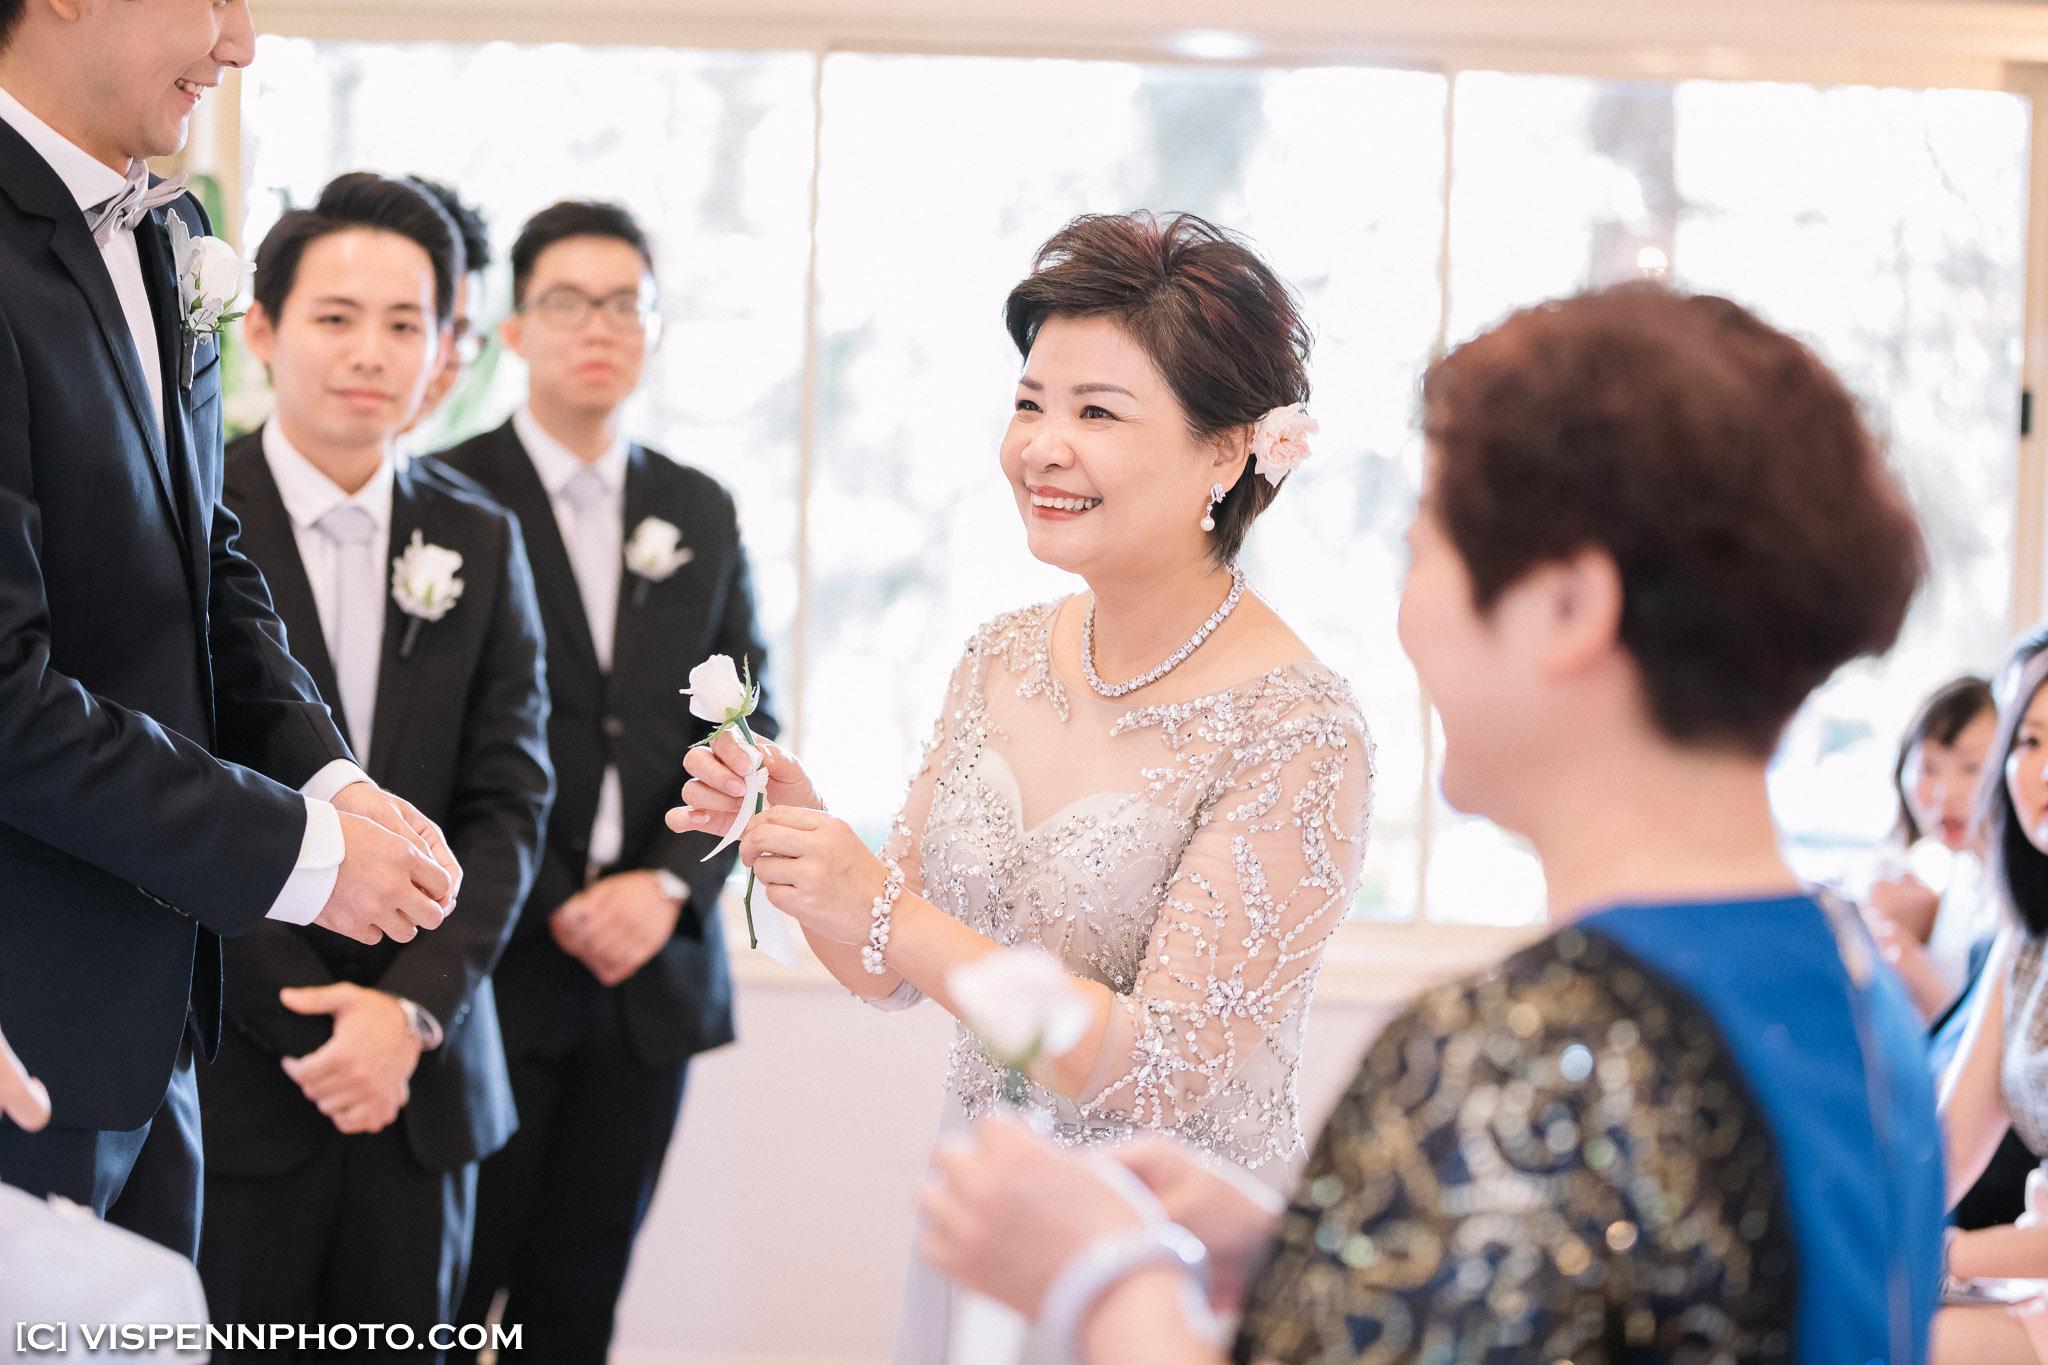 WEDDING DAY Photography Melbourne ZHPENN H4 0282